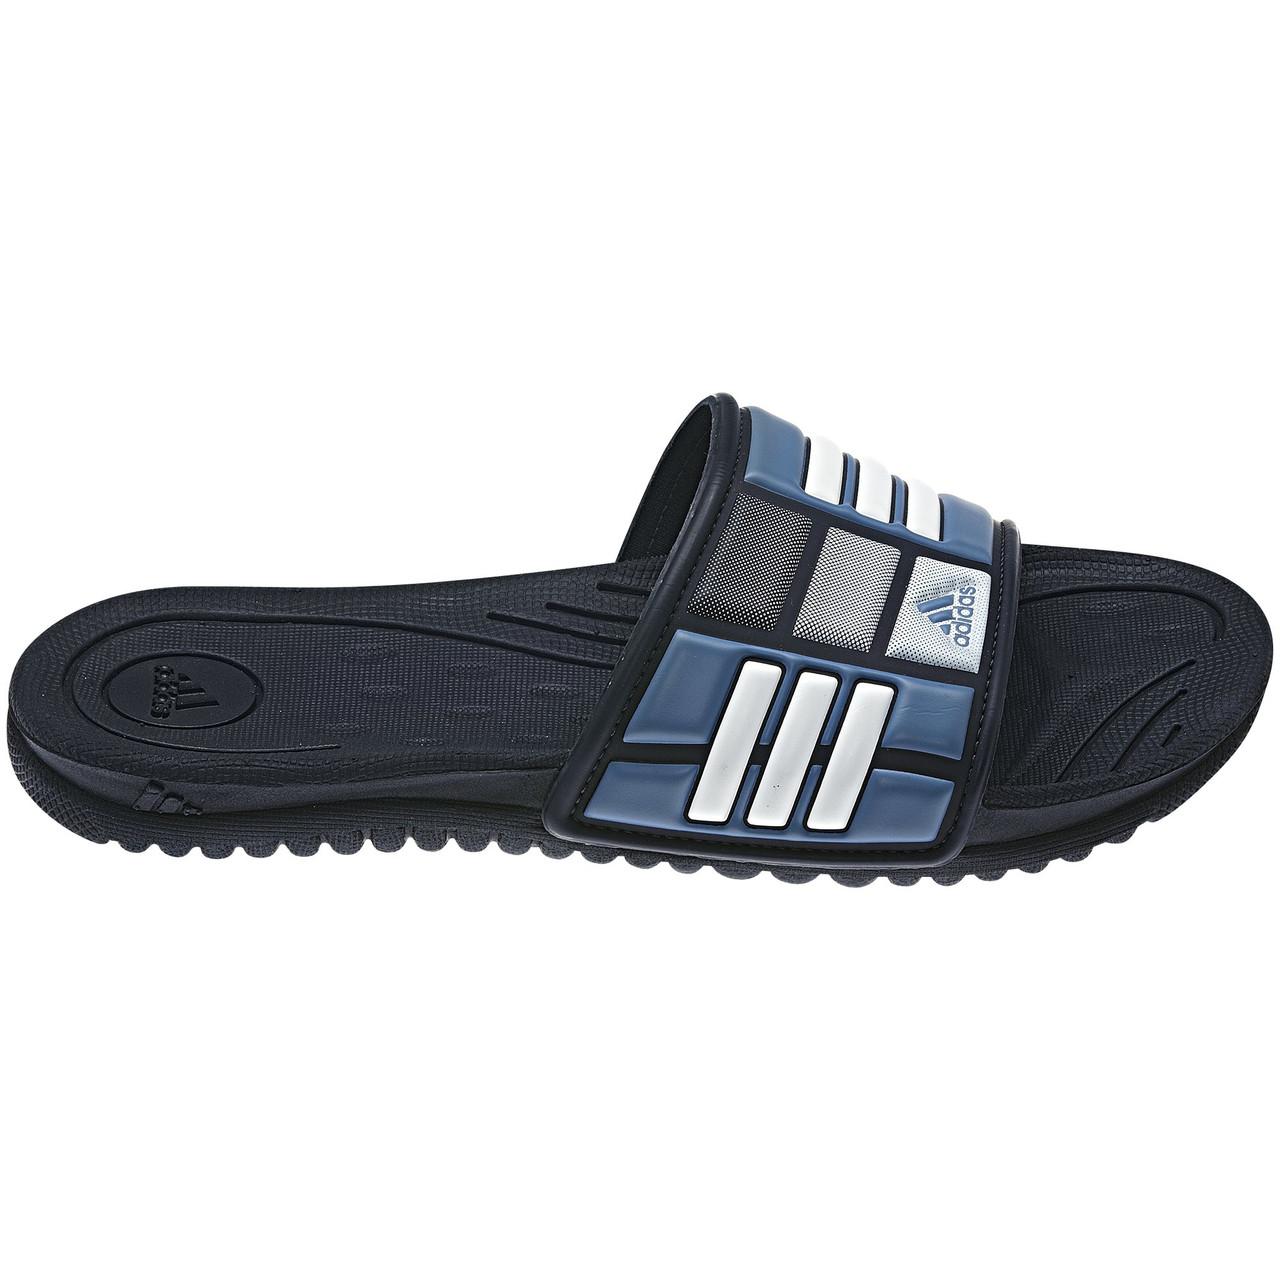 Мужские шлепанцы adidas MUNGO QD (Артикул: 010629)